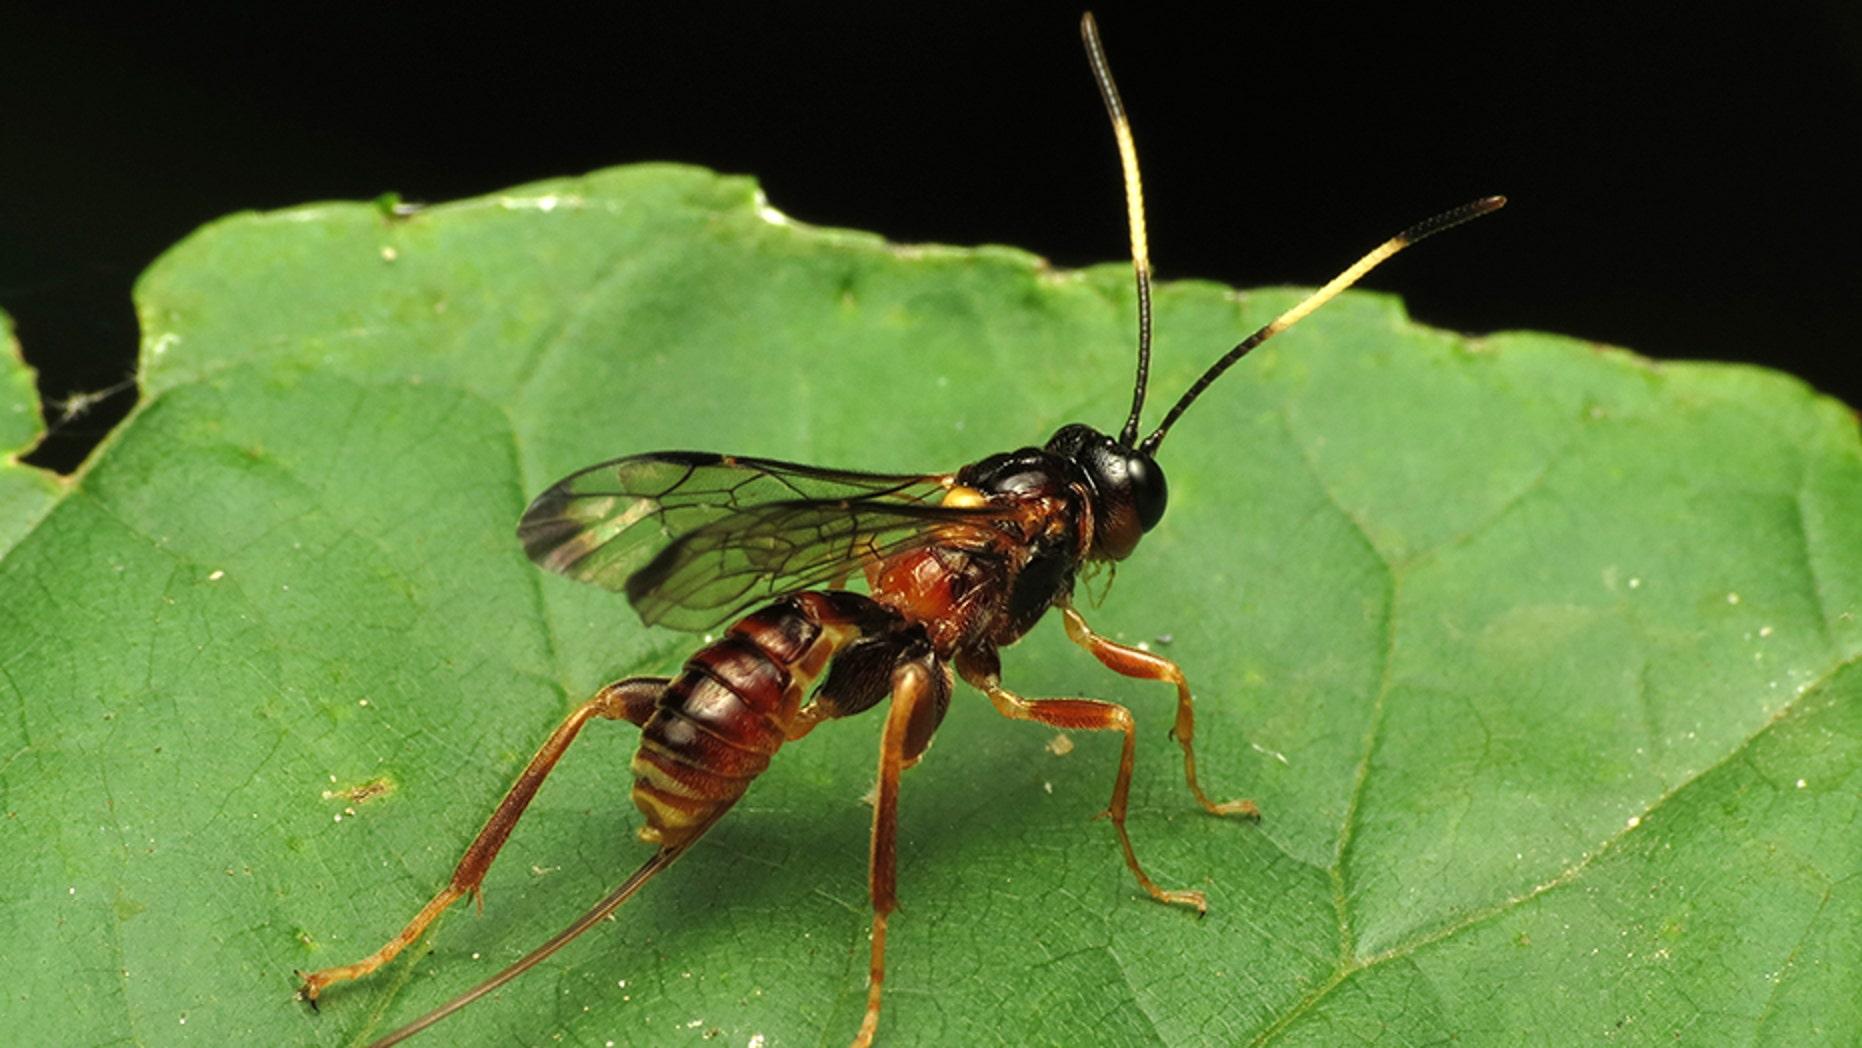 Parasitic wasp. (Credit: WikiMedia)